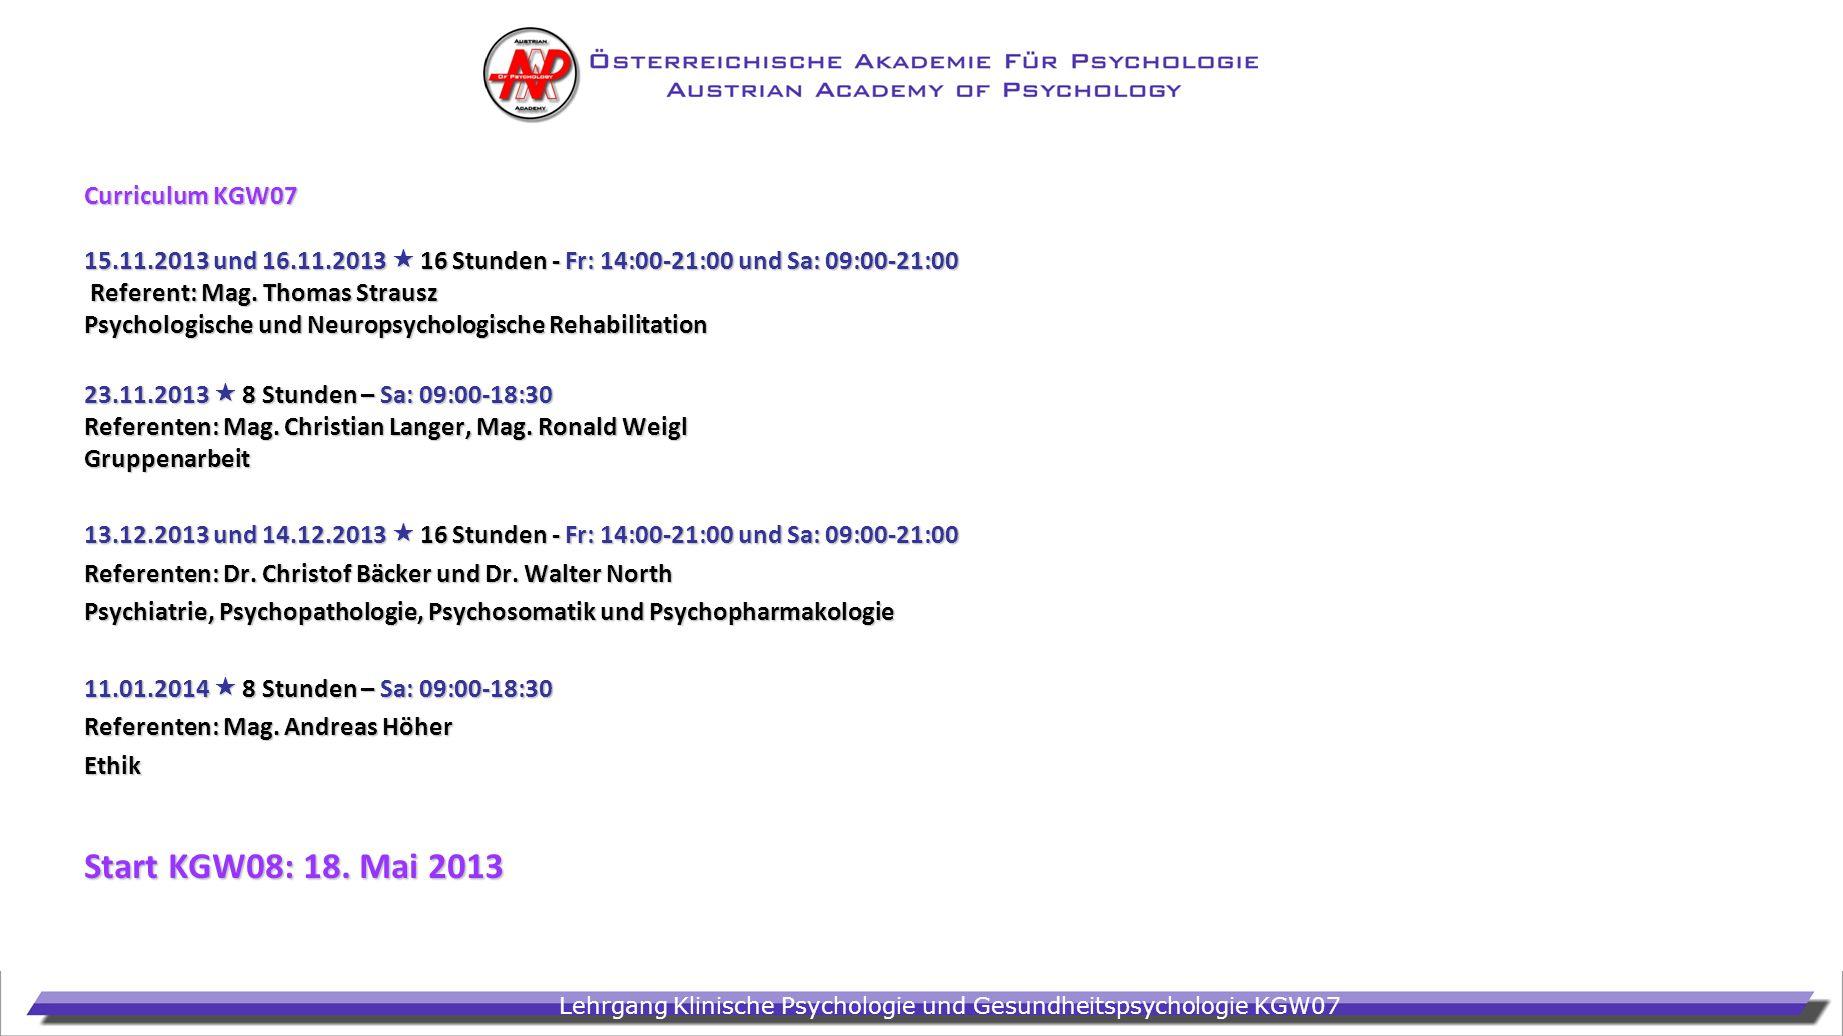 Start KGW08: 18. Mai 2013 Curriculum KGW07